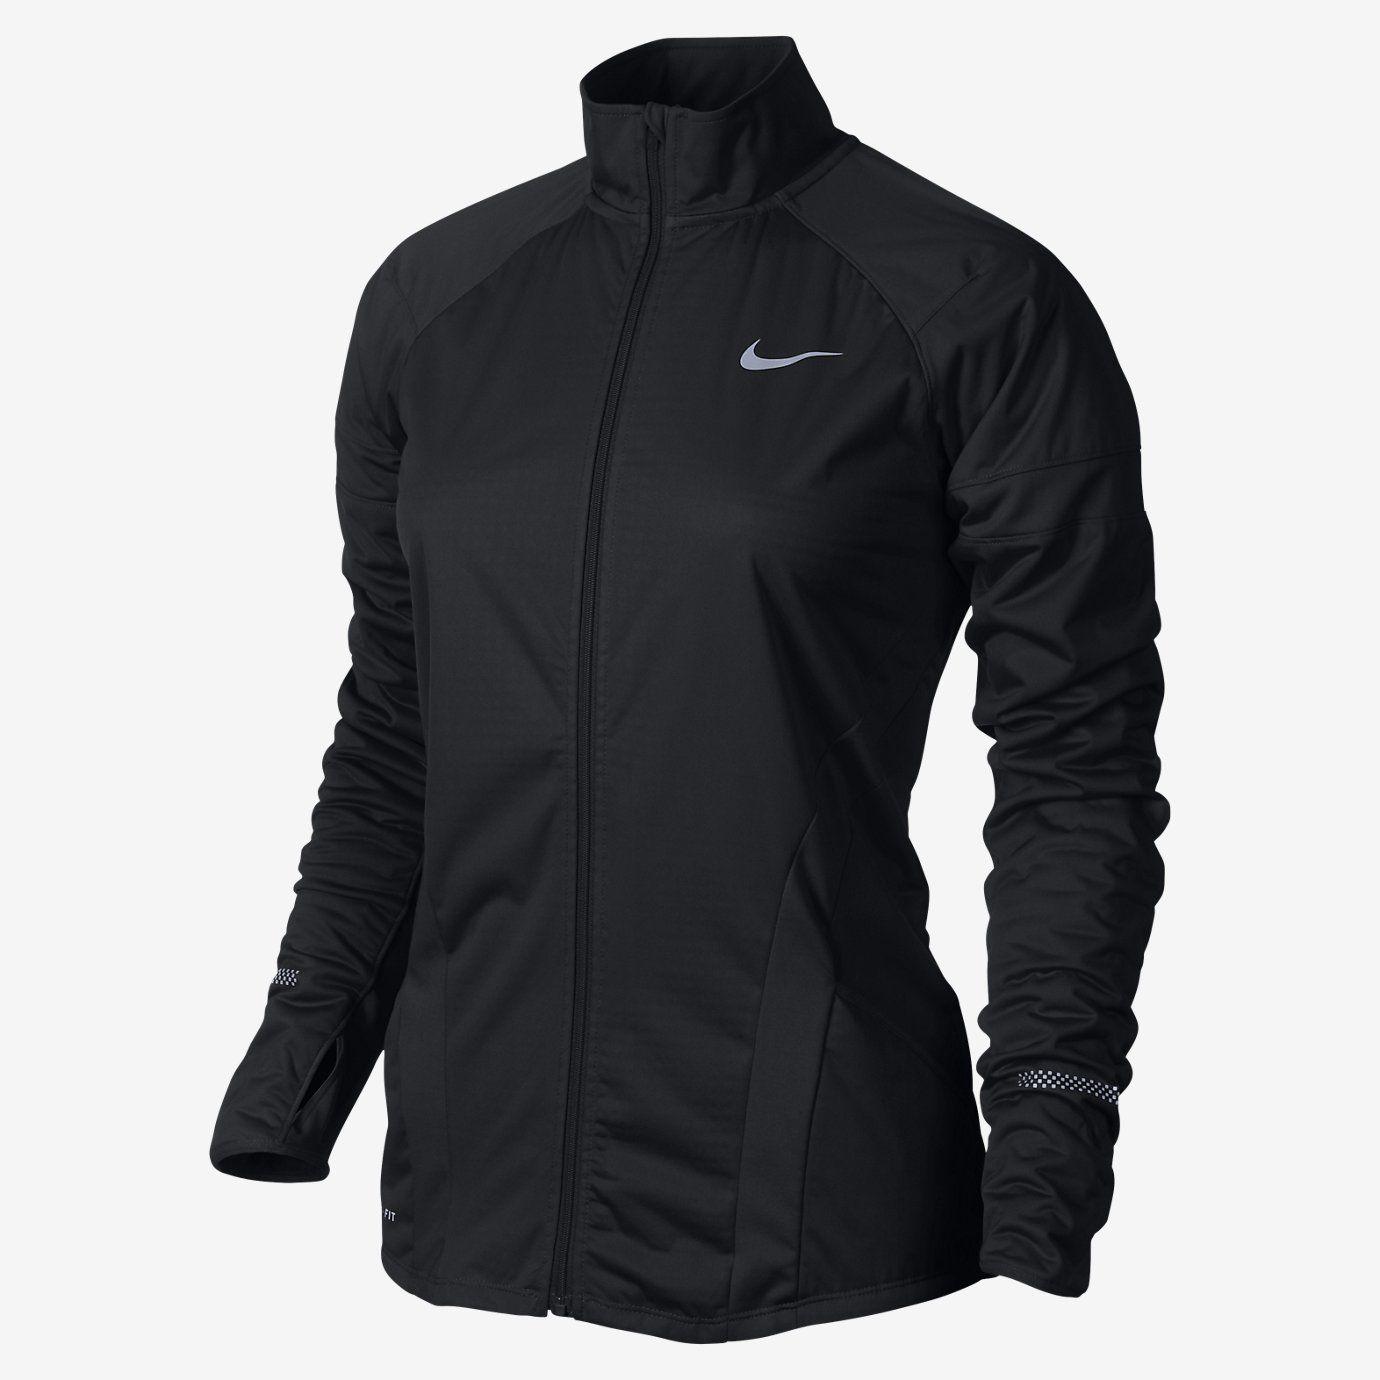 b5a0e985bd9d Nike Element Shield Full-Zip Women s Running Jacket. Nike Store ...